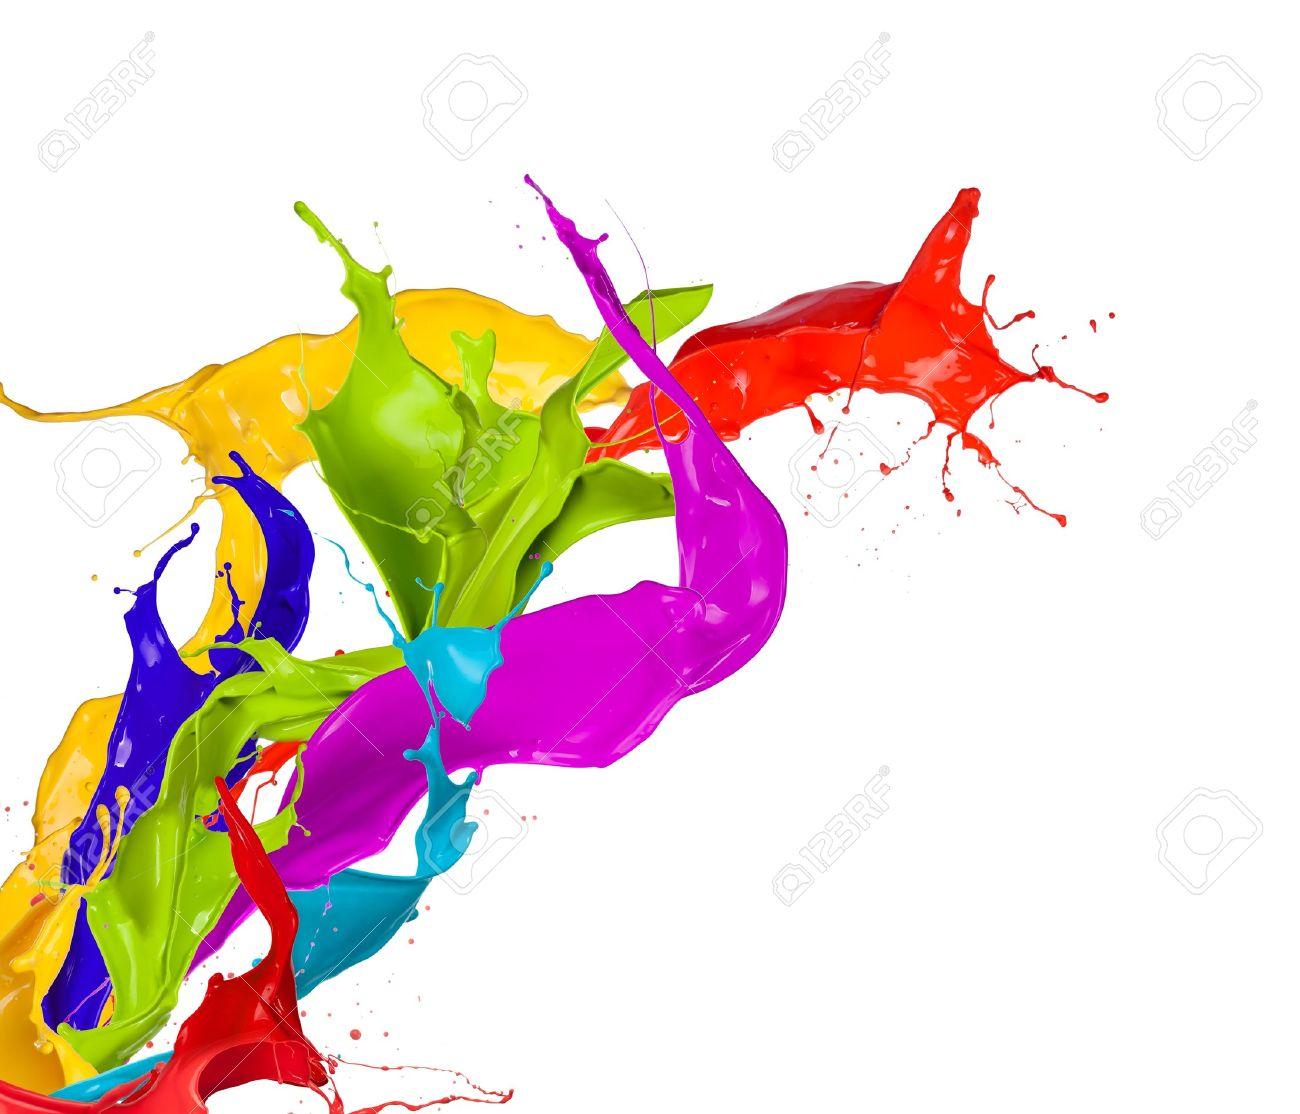 Colored paint splashes isolated on white background - 16593927